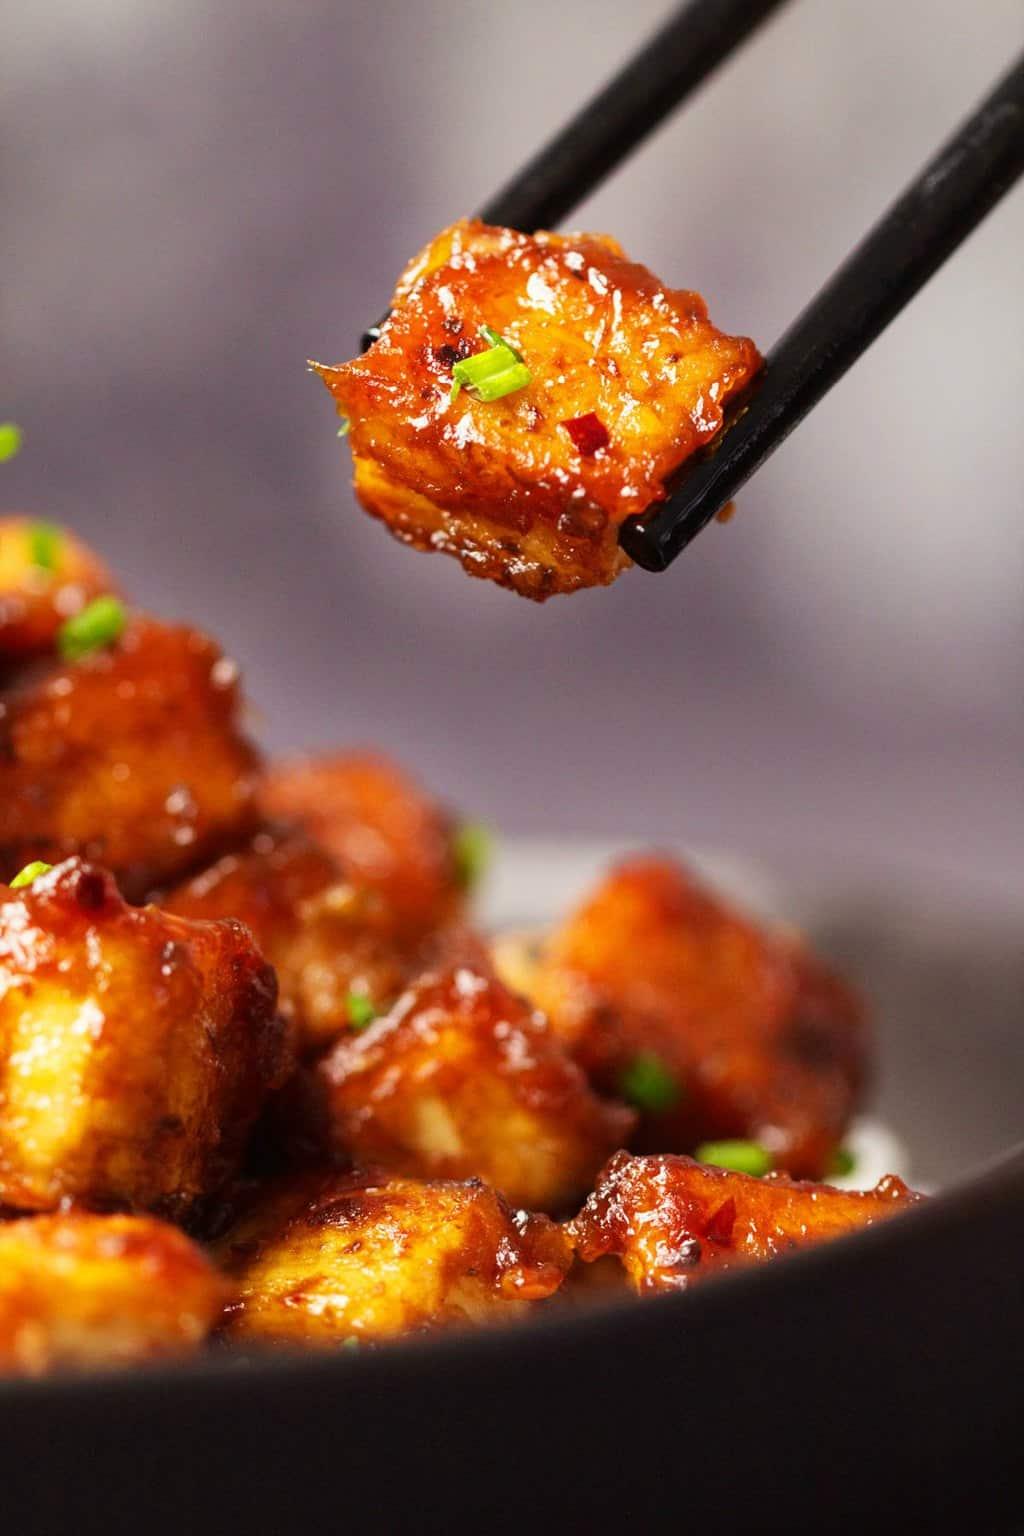 General Tso's tofu in a black bowl with chopsticks.